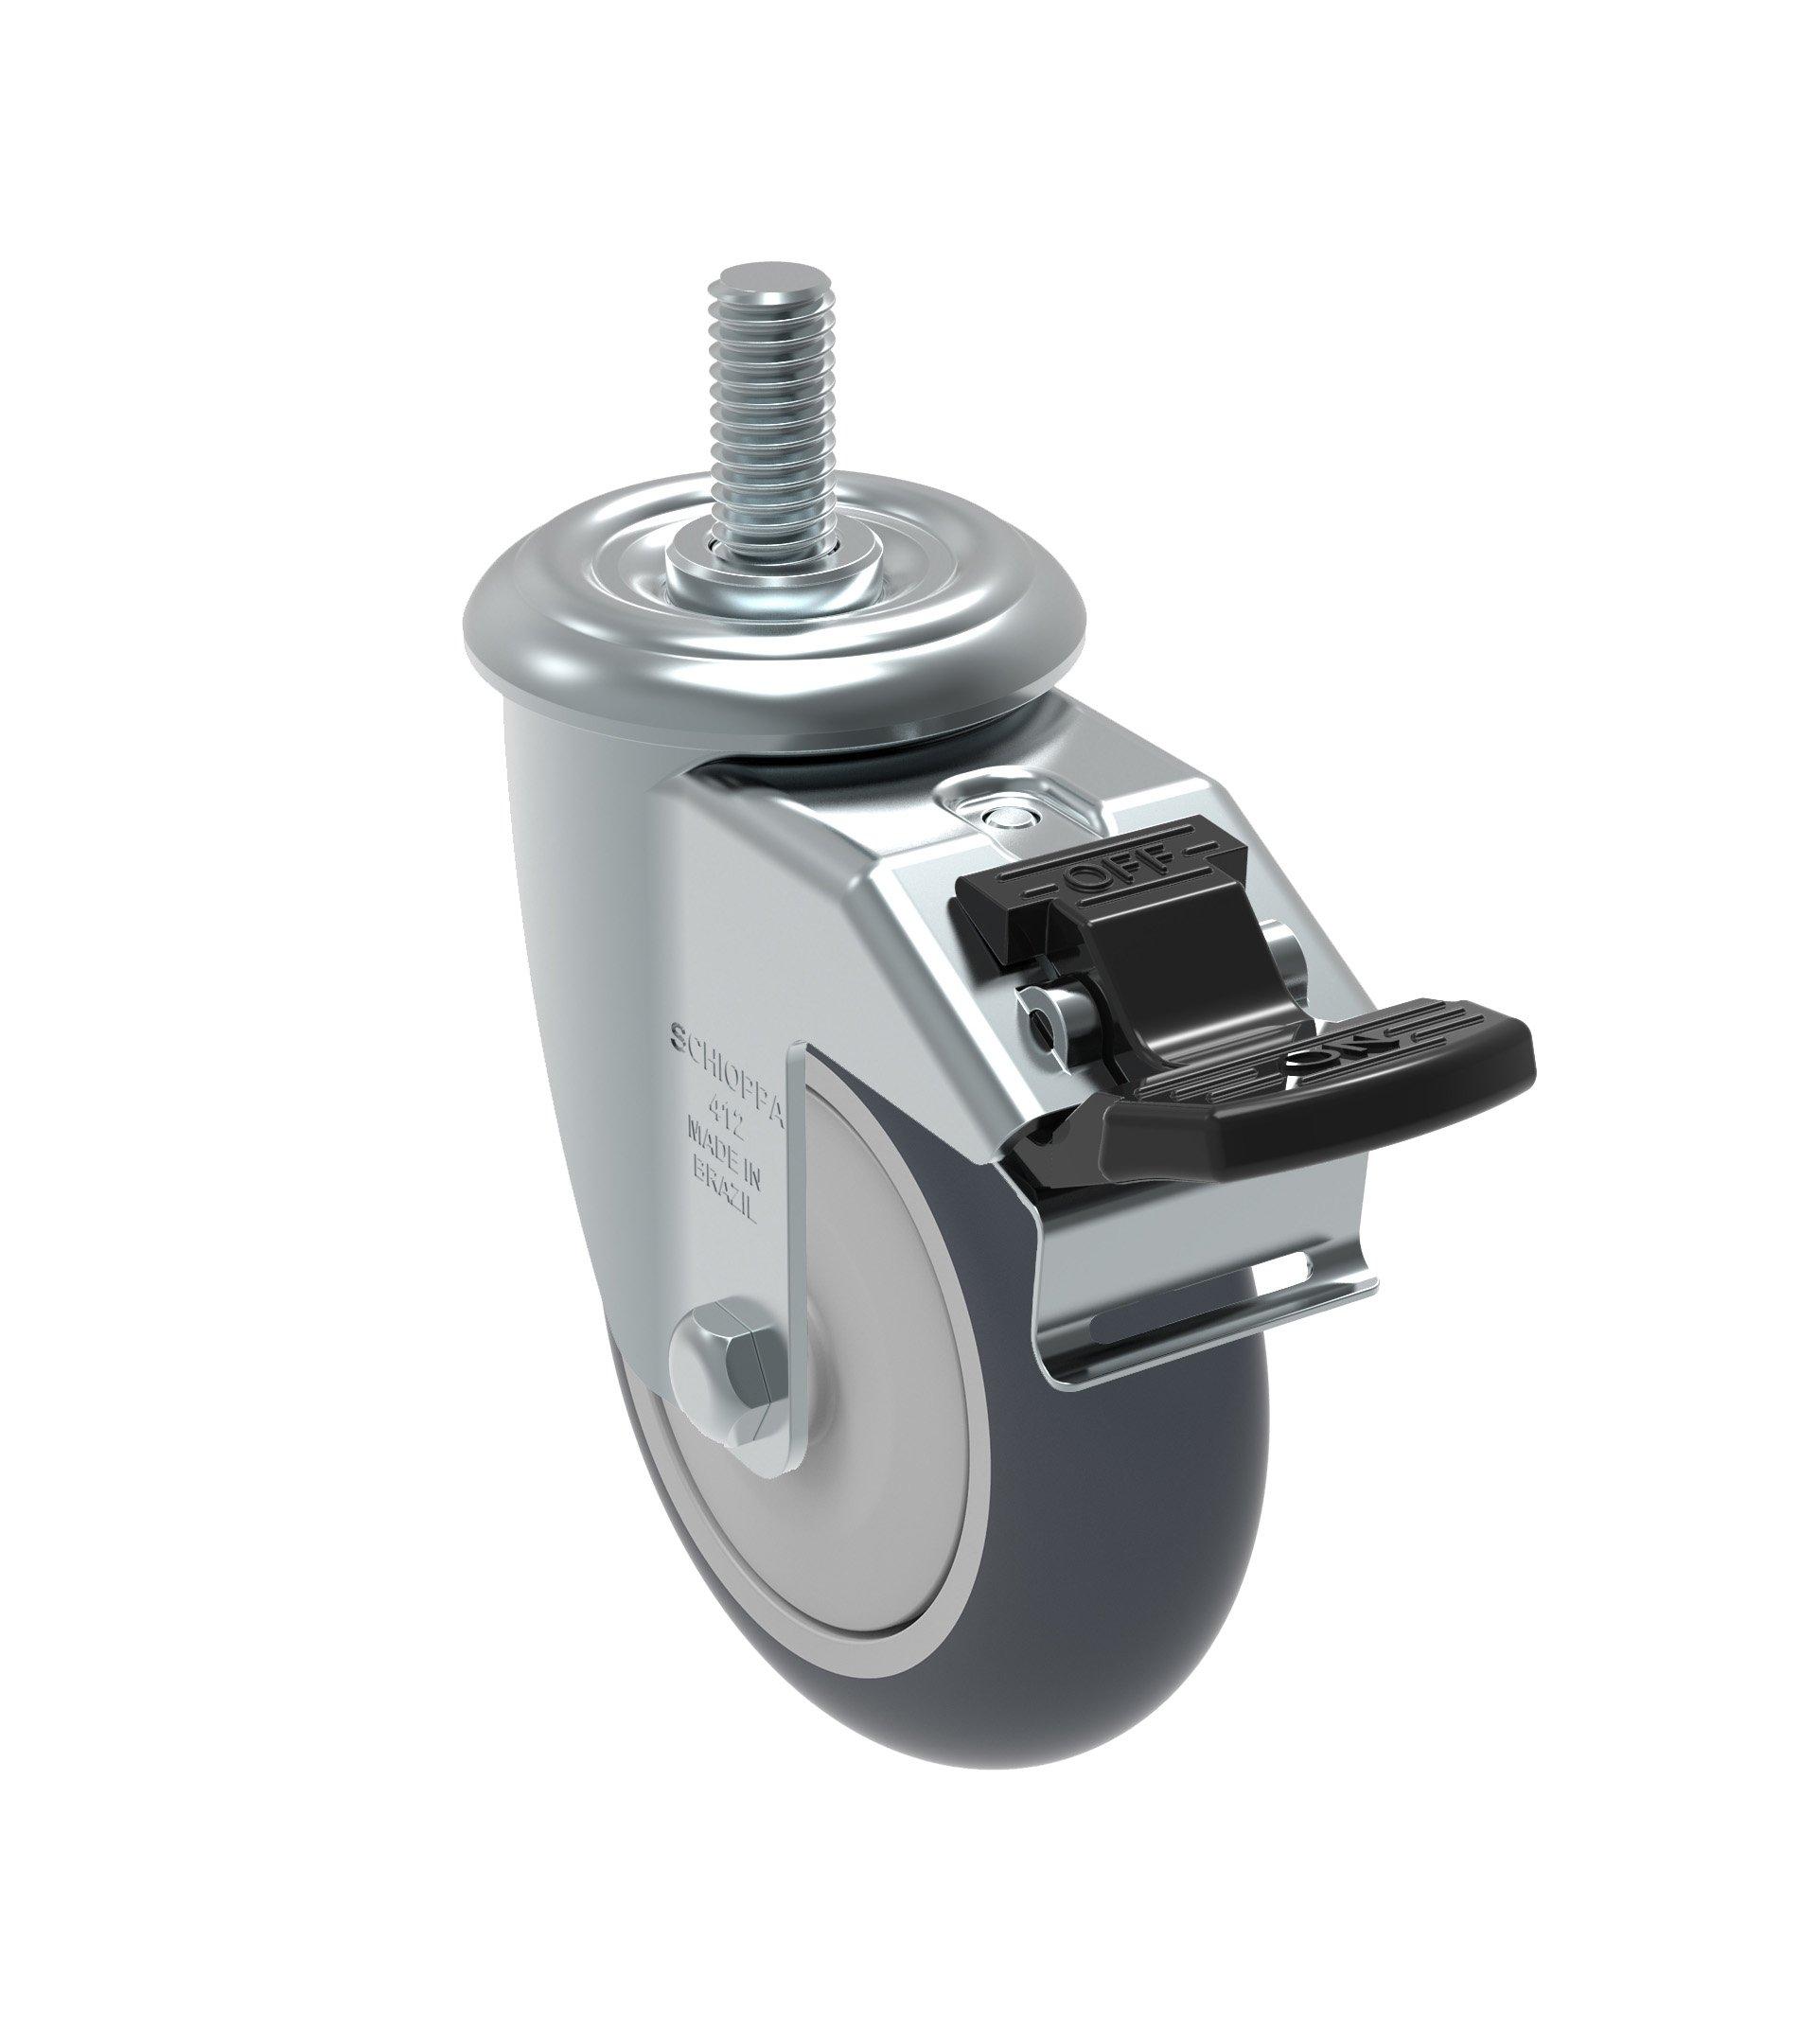 Schioppa GLEEF 412 TBE G L12 Series 4'' x 1-1/4'' Diameter Swivel Caster with Total Lock Brake, Non-Marking Thermoplastic Rubber Precision Ball Bearing Wheel, 3/8'' Diameter x 1-1/2'' Length Threaded Stem, 220 lb